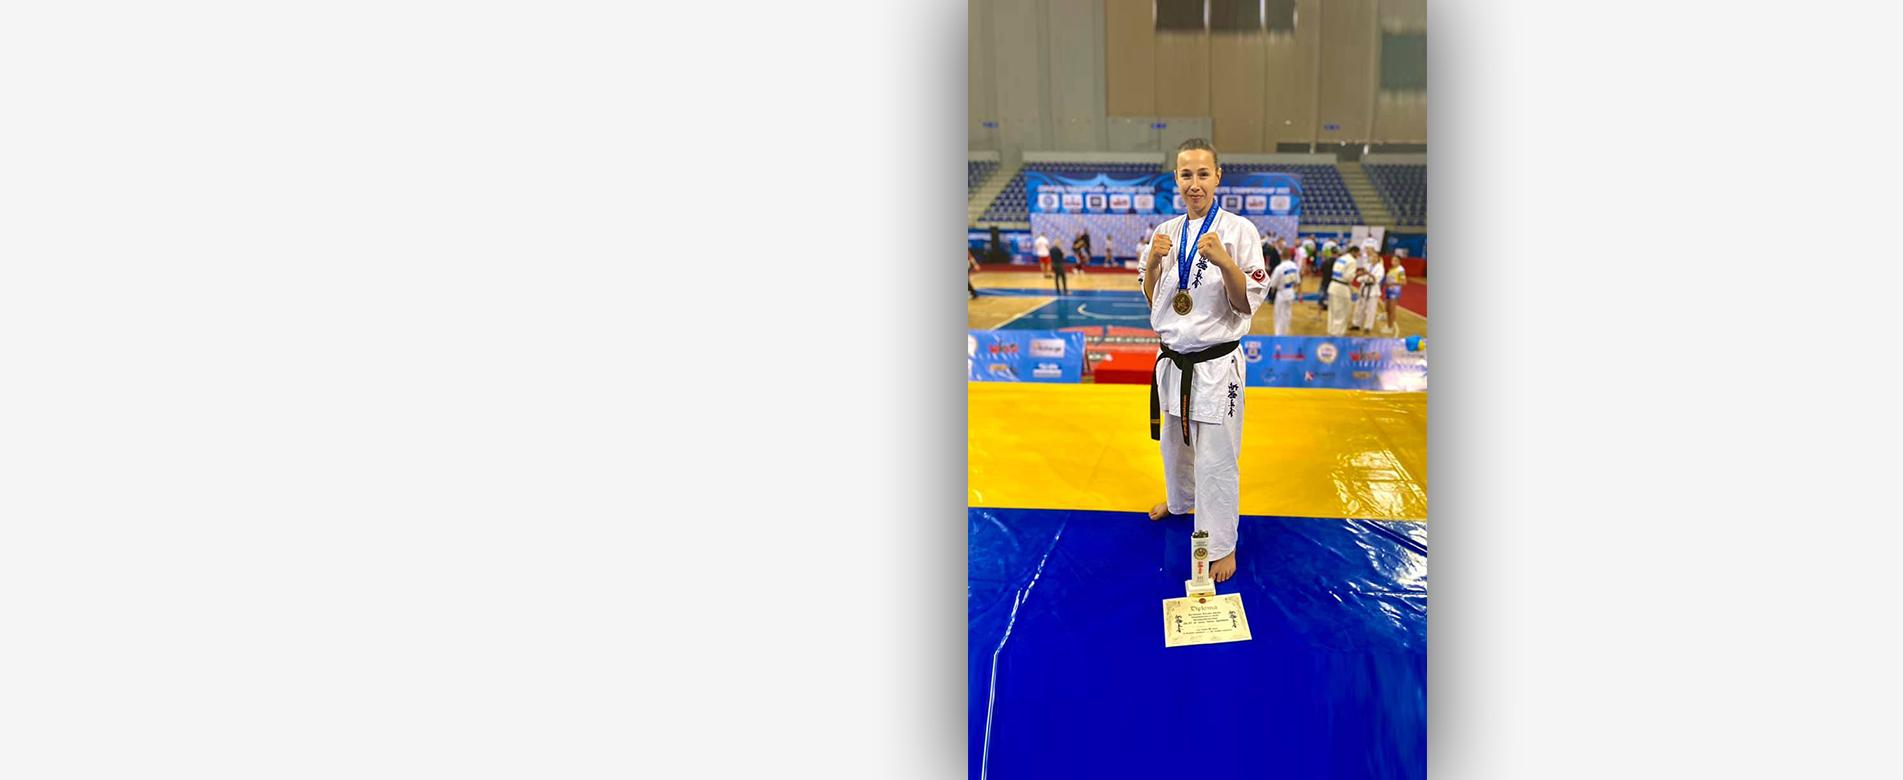 Európa-bajnoki bronzérmes lett hallgatónk